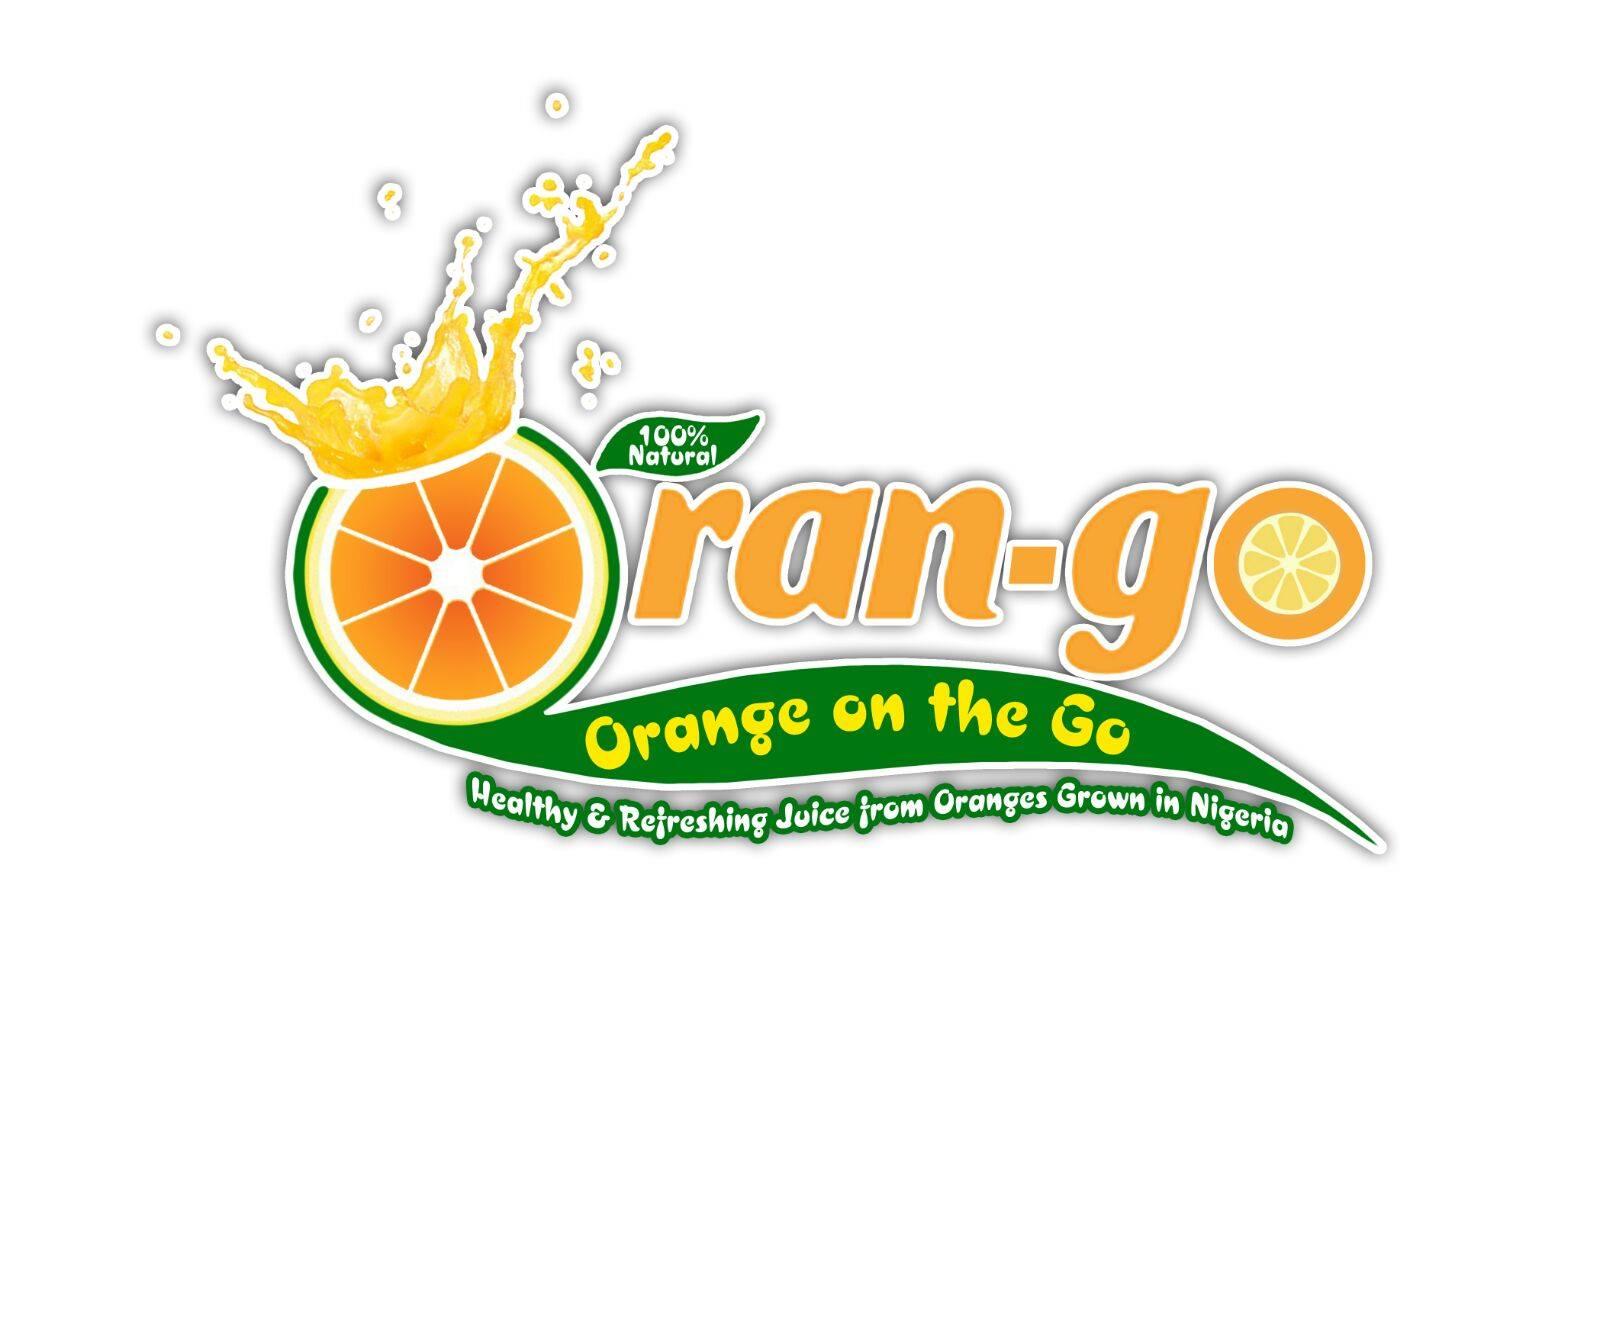 Nigerian Business Innovates Orange Consumption With Orange Juice On The Go